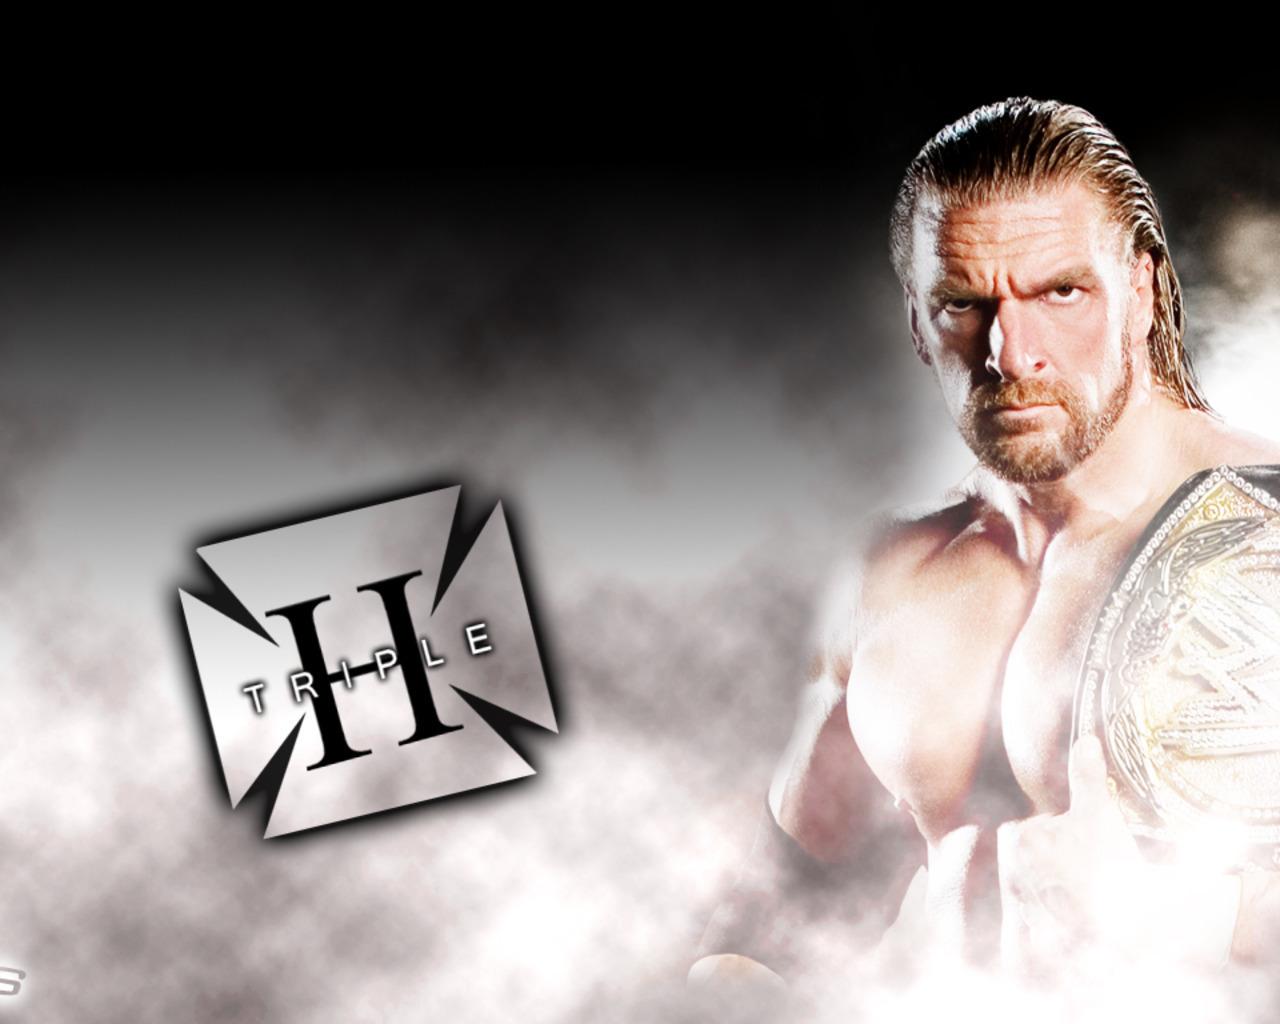 Triple H and Taker Wallpaper by kapaeme on DeviantArt